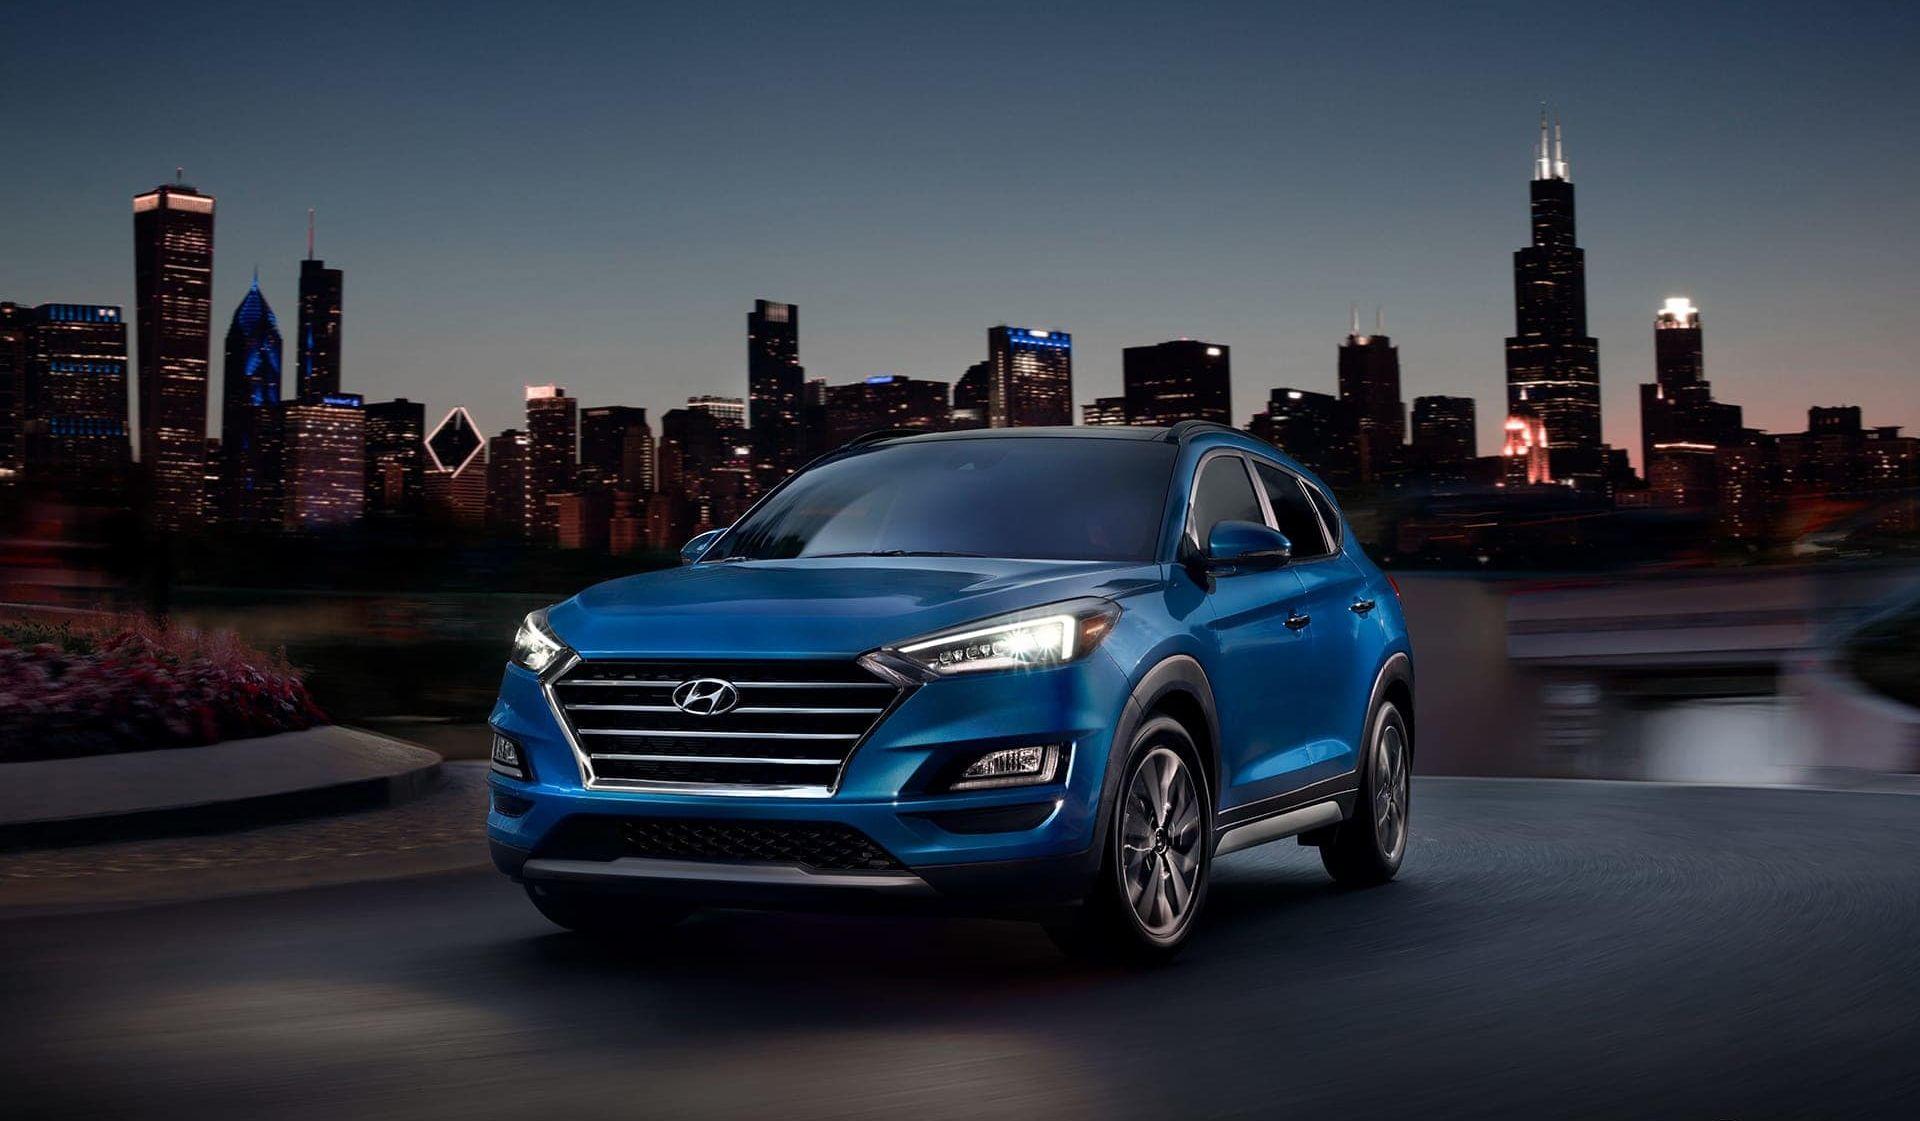 2019 Hyundai Tucson Leasing near College Park, MD